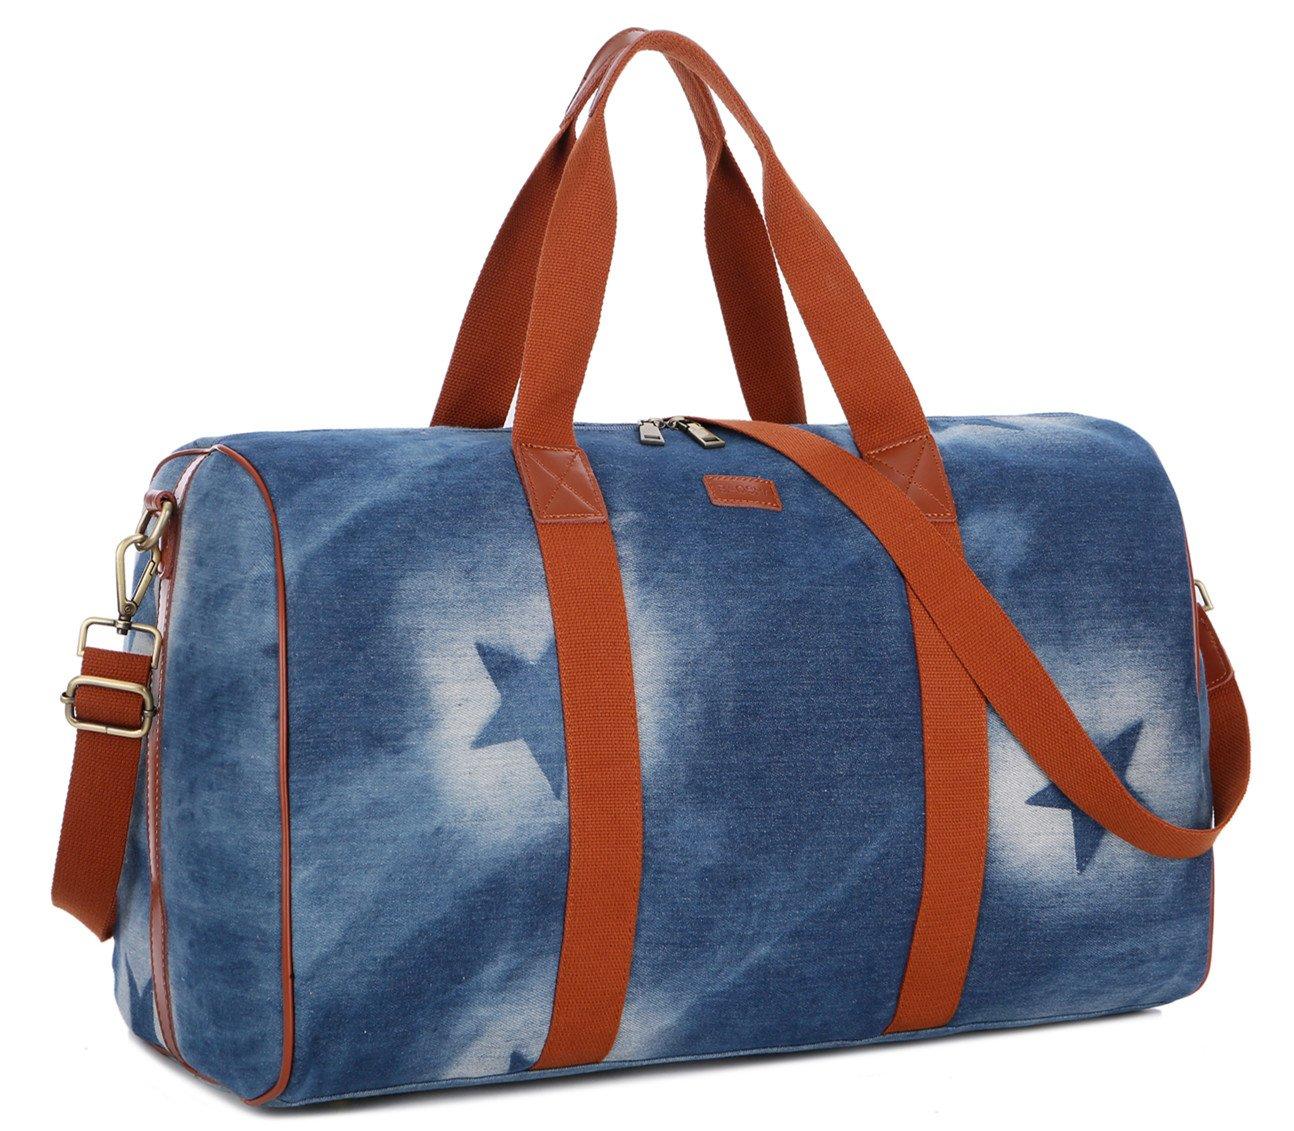 BAOSHA HB-24 Ladies Women Canvas Weekender Bag Cosmetic Travel Bag Overnight Carry on Bag (Blue Star)